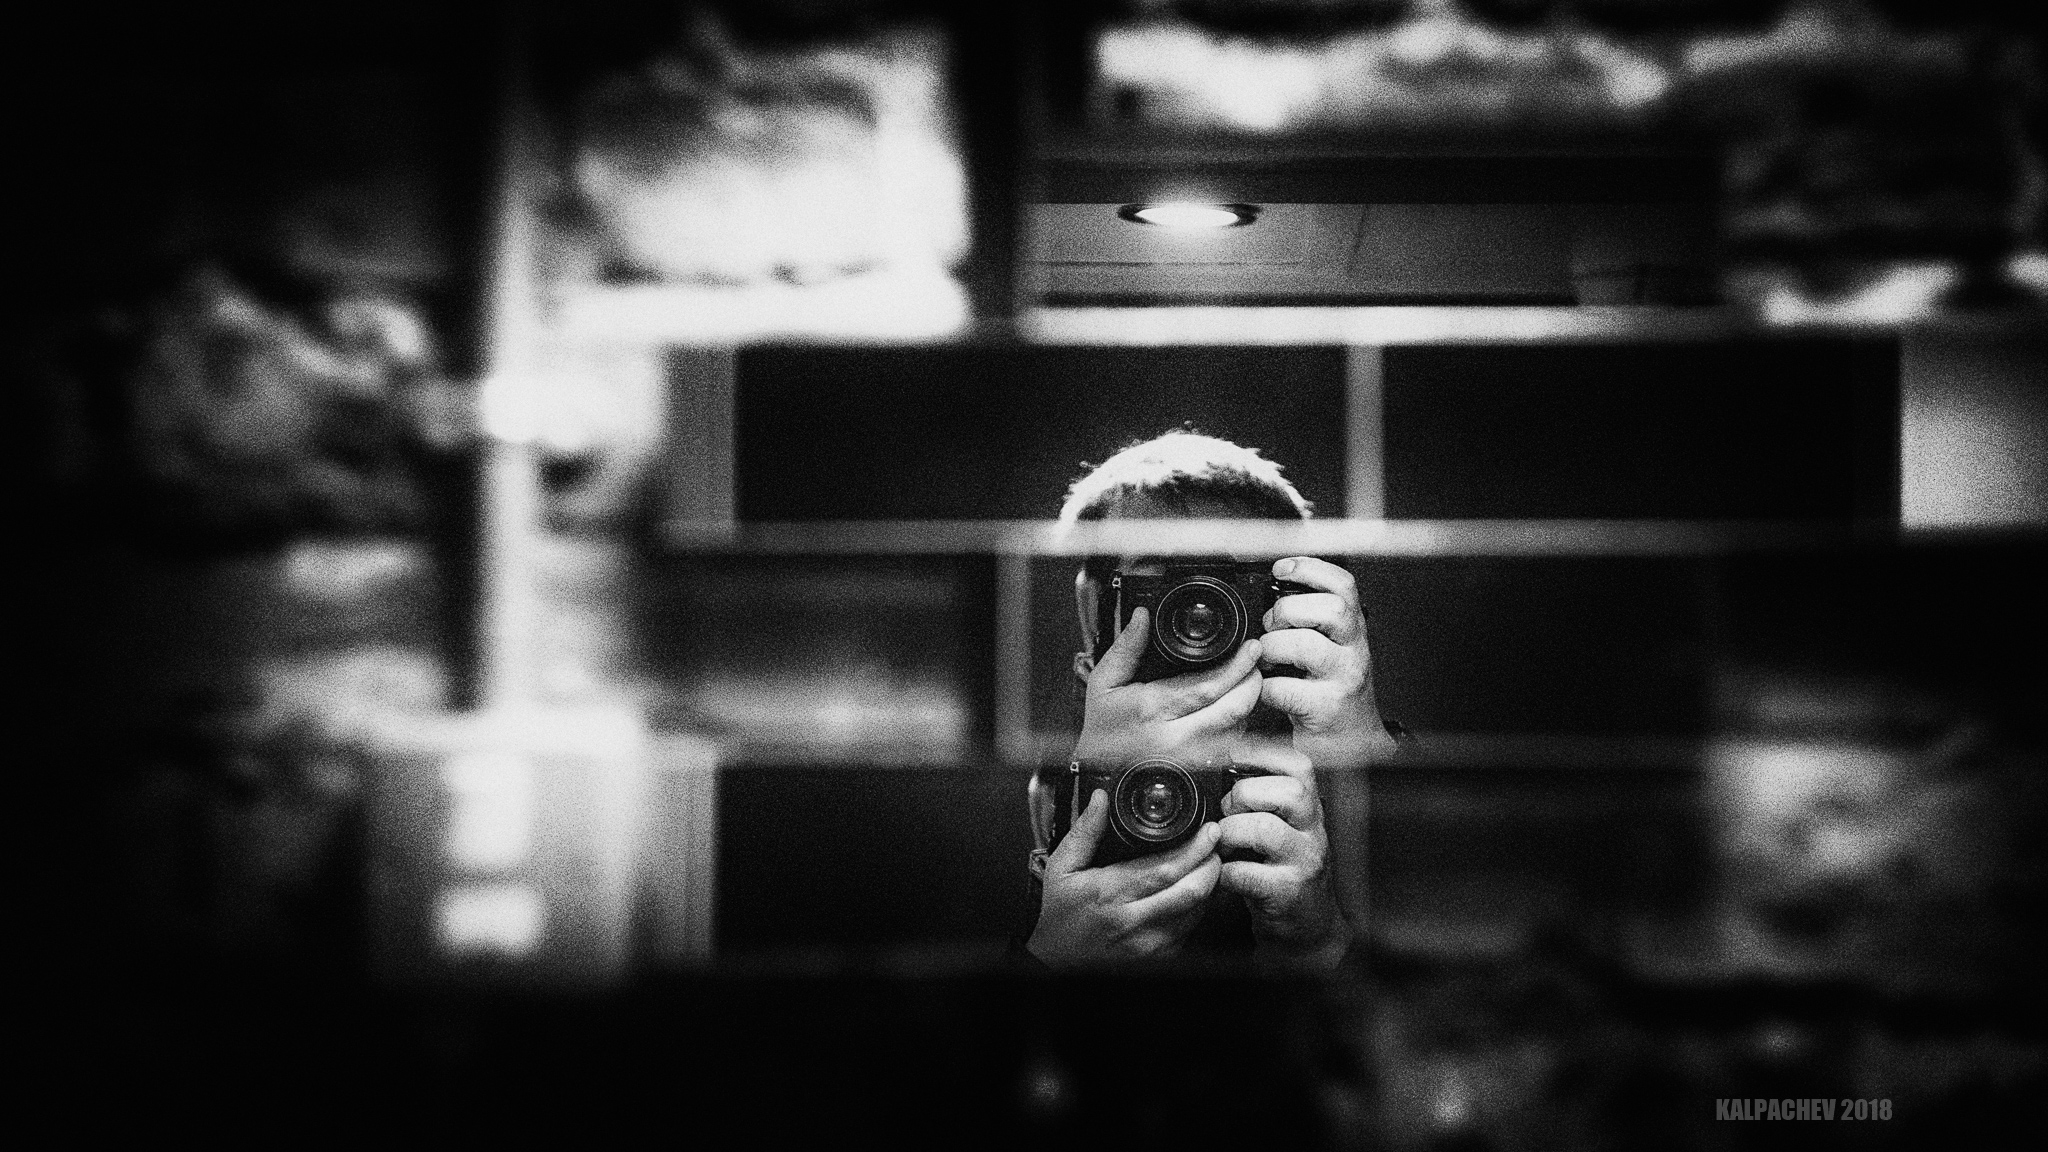 Self portrait 2016 -remastered-